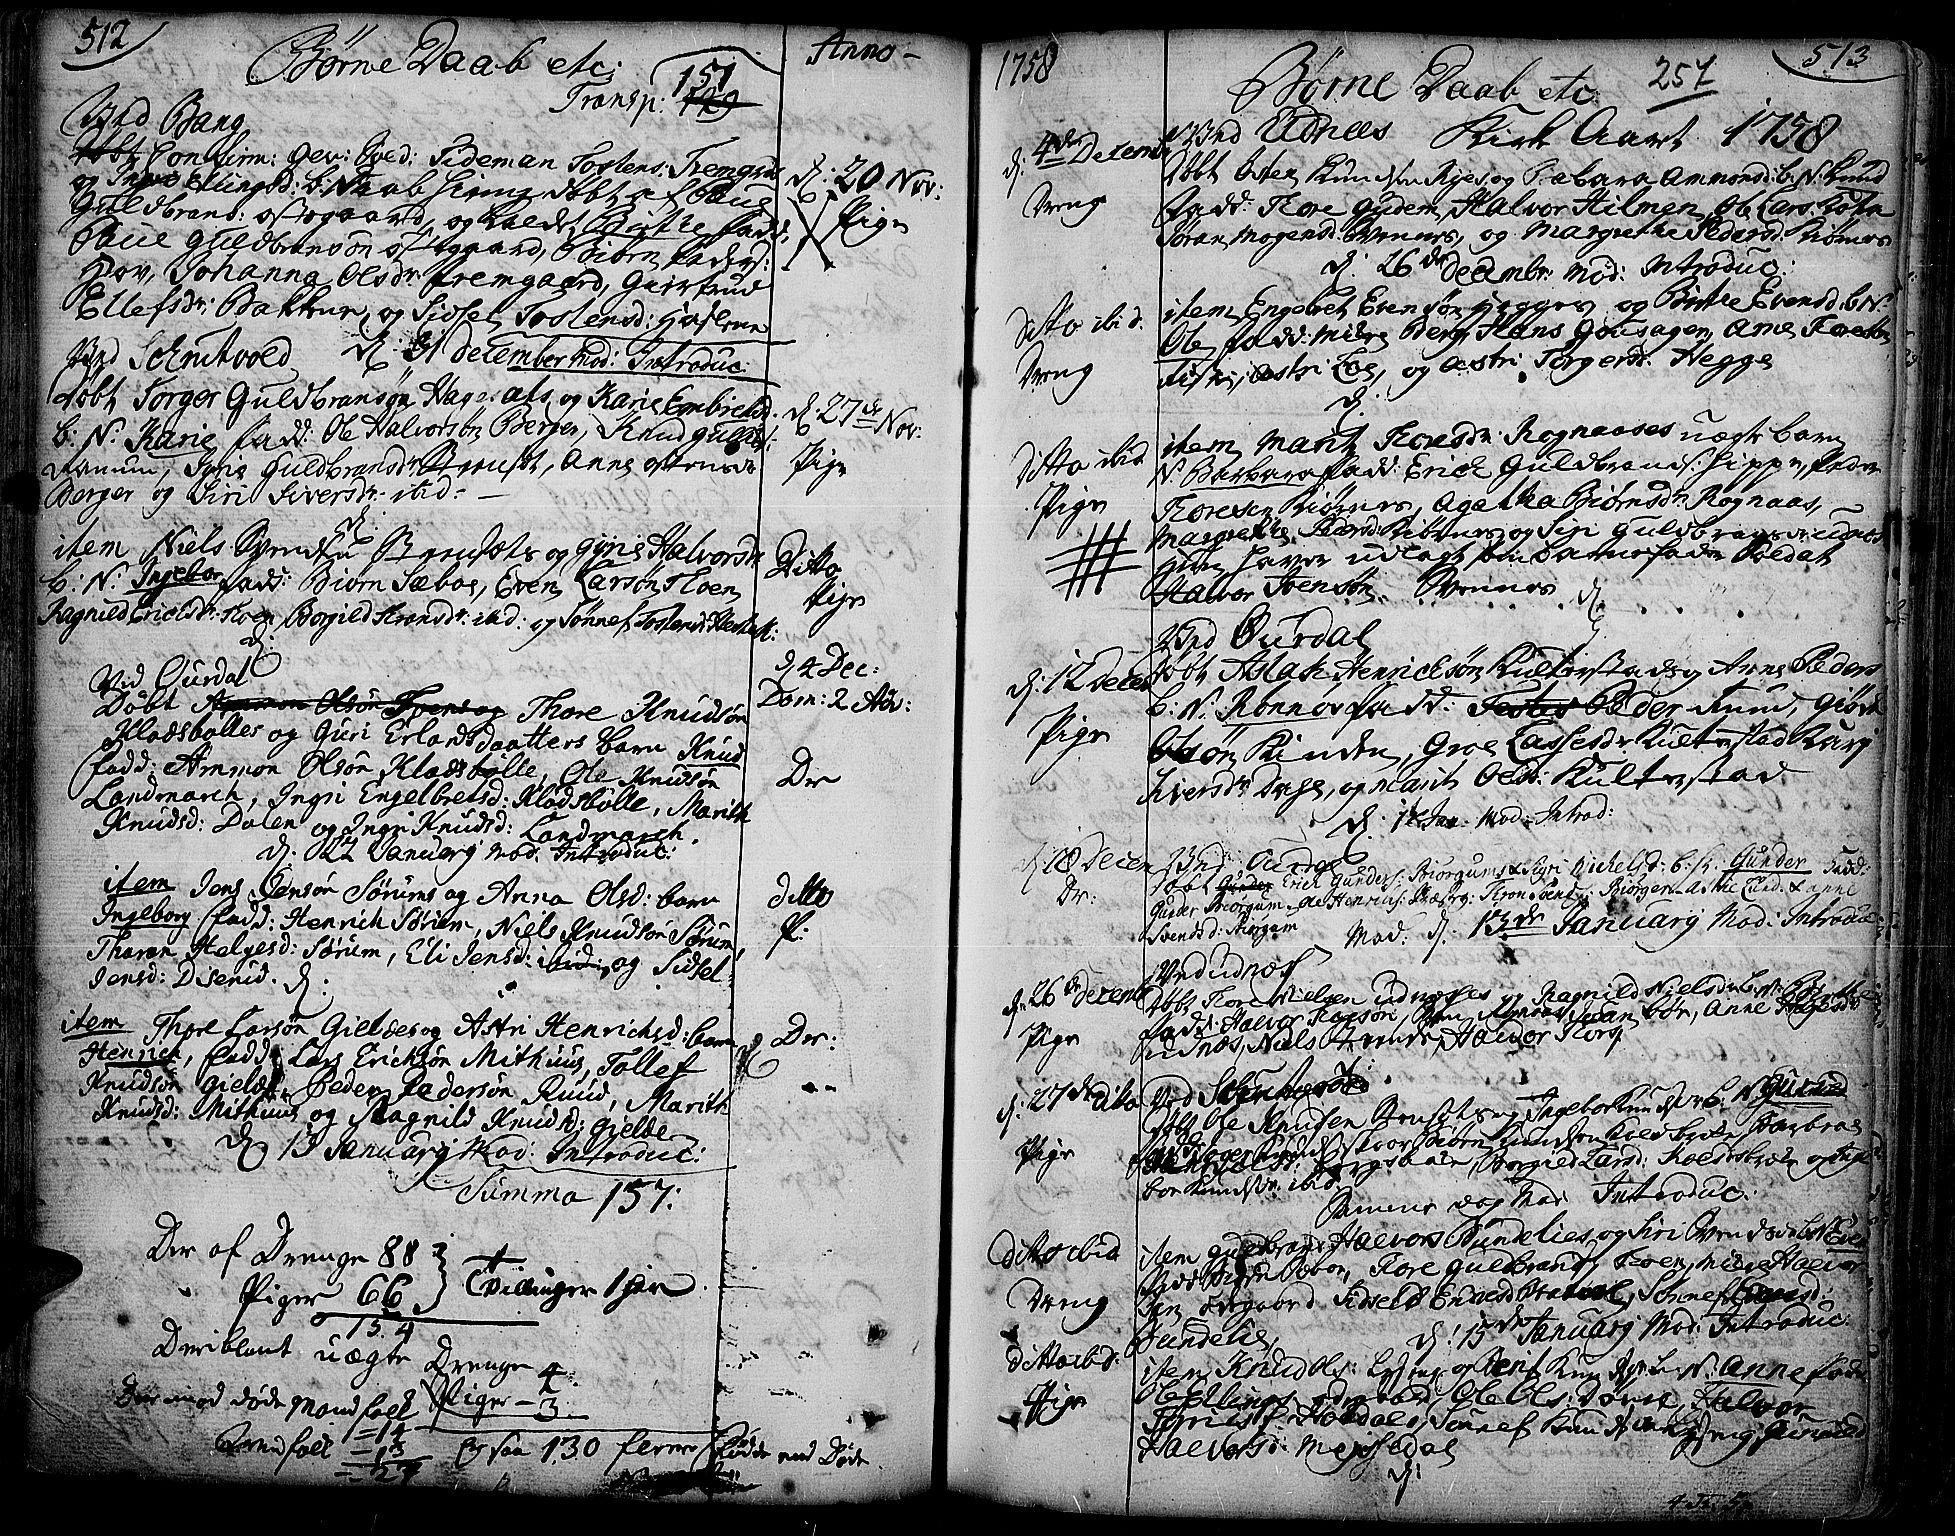 SAH, Aurdal prestekontor, Ministerialbok nr. 4, 1730-1762, s. 512-513